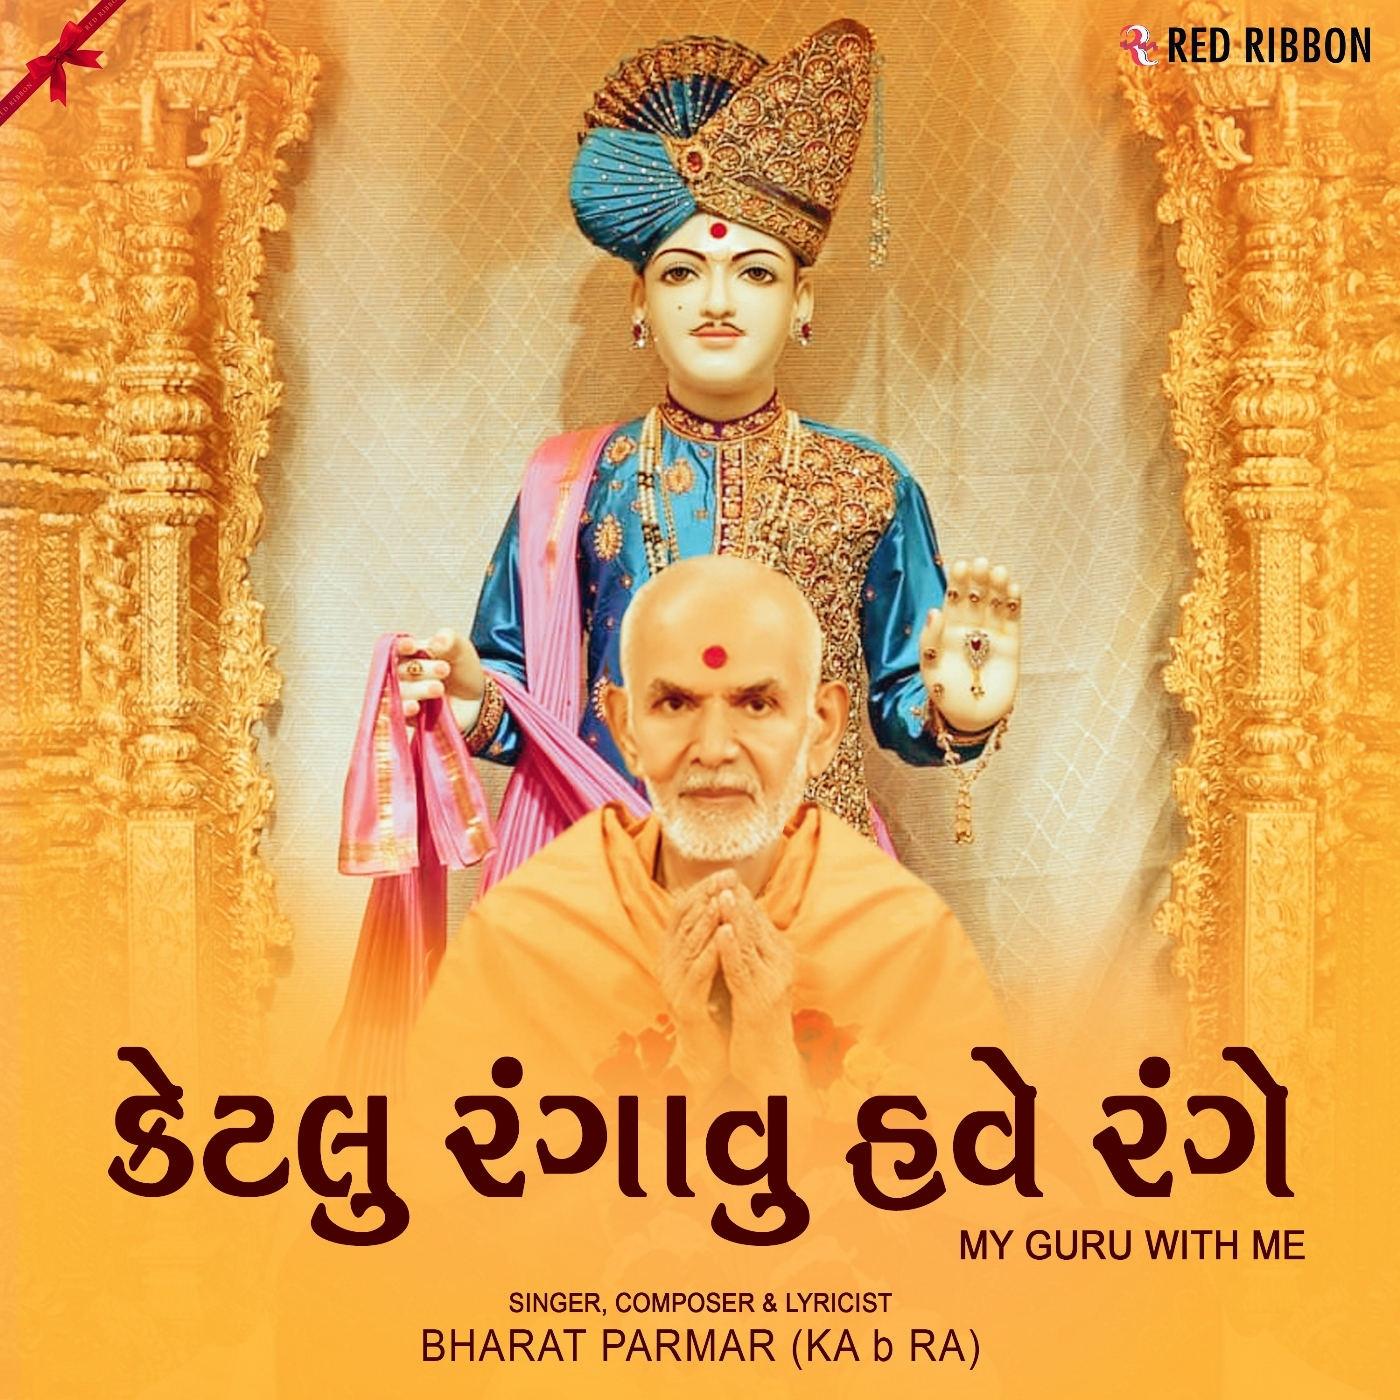 Ketlu Rangavu Have Range (My Guru With Me) songs